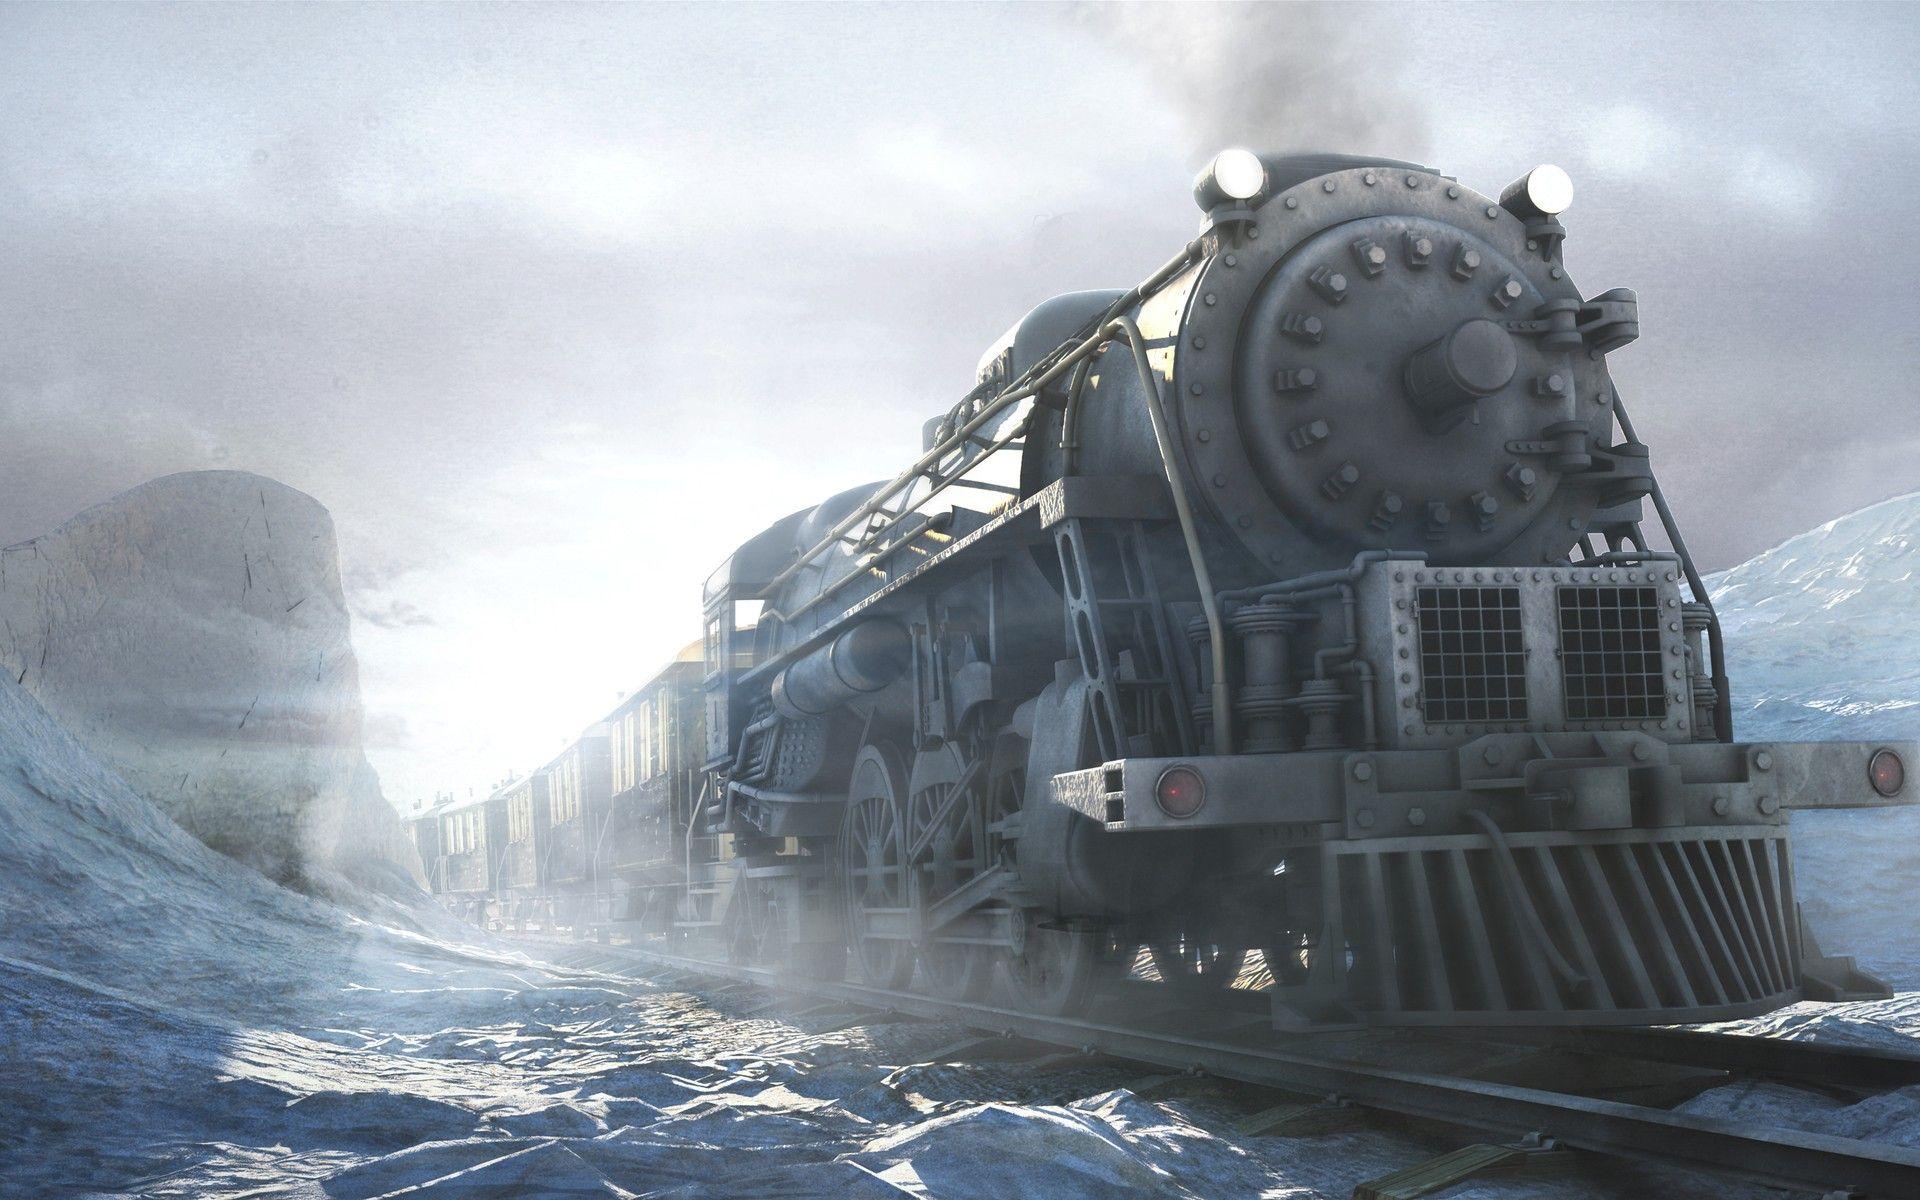 44+ Fallout 4 Railroad Wallpaper on WallpaperSafari